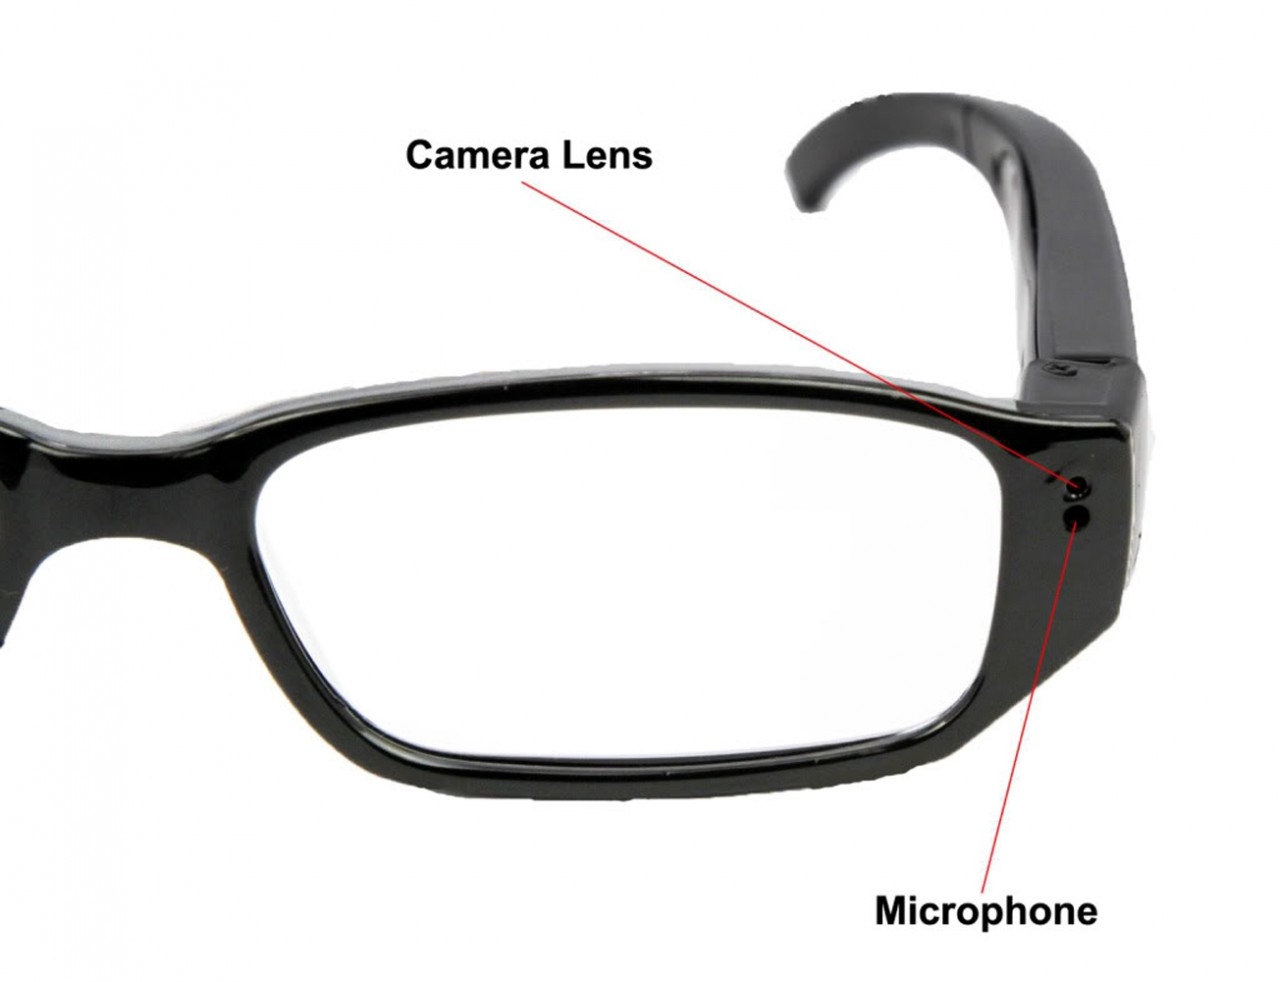 e710fdb1064 Hidden Glasses Security Camera 720p HD Price In Pakistan